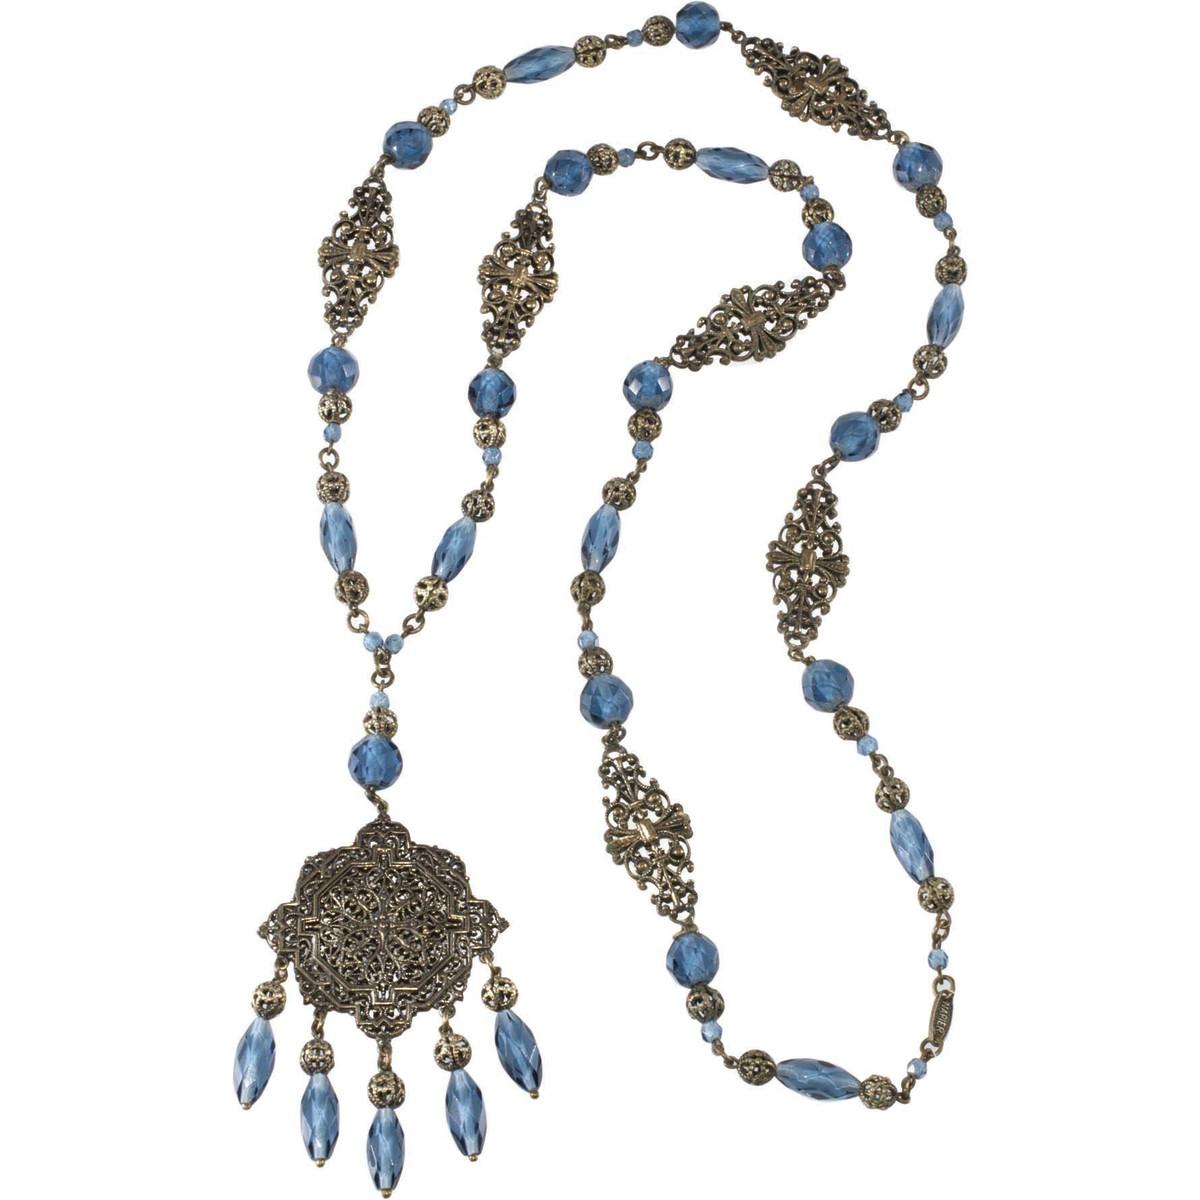 Napier sautoir necklace, early 1920s.